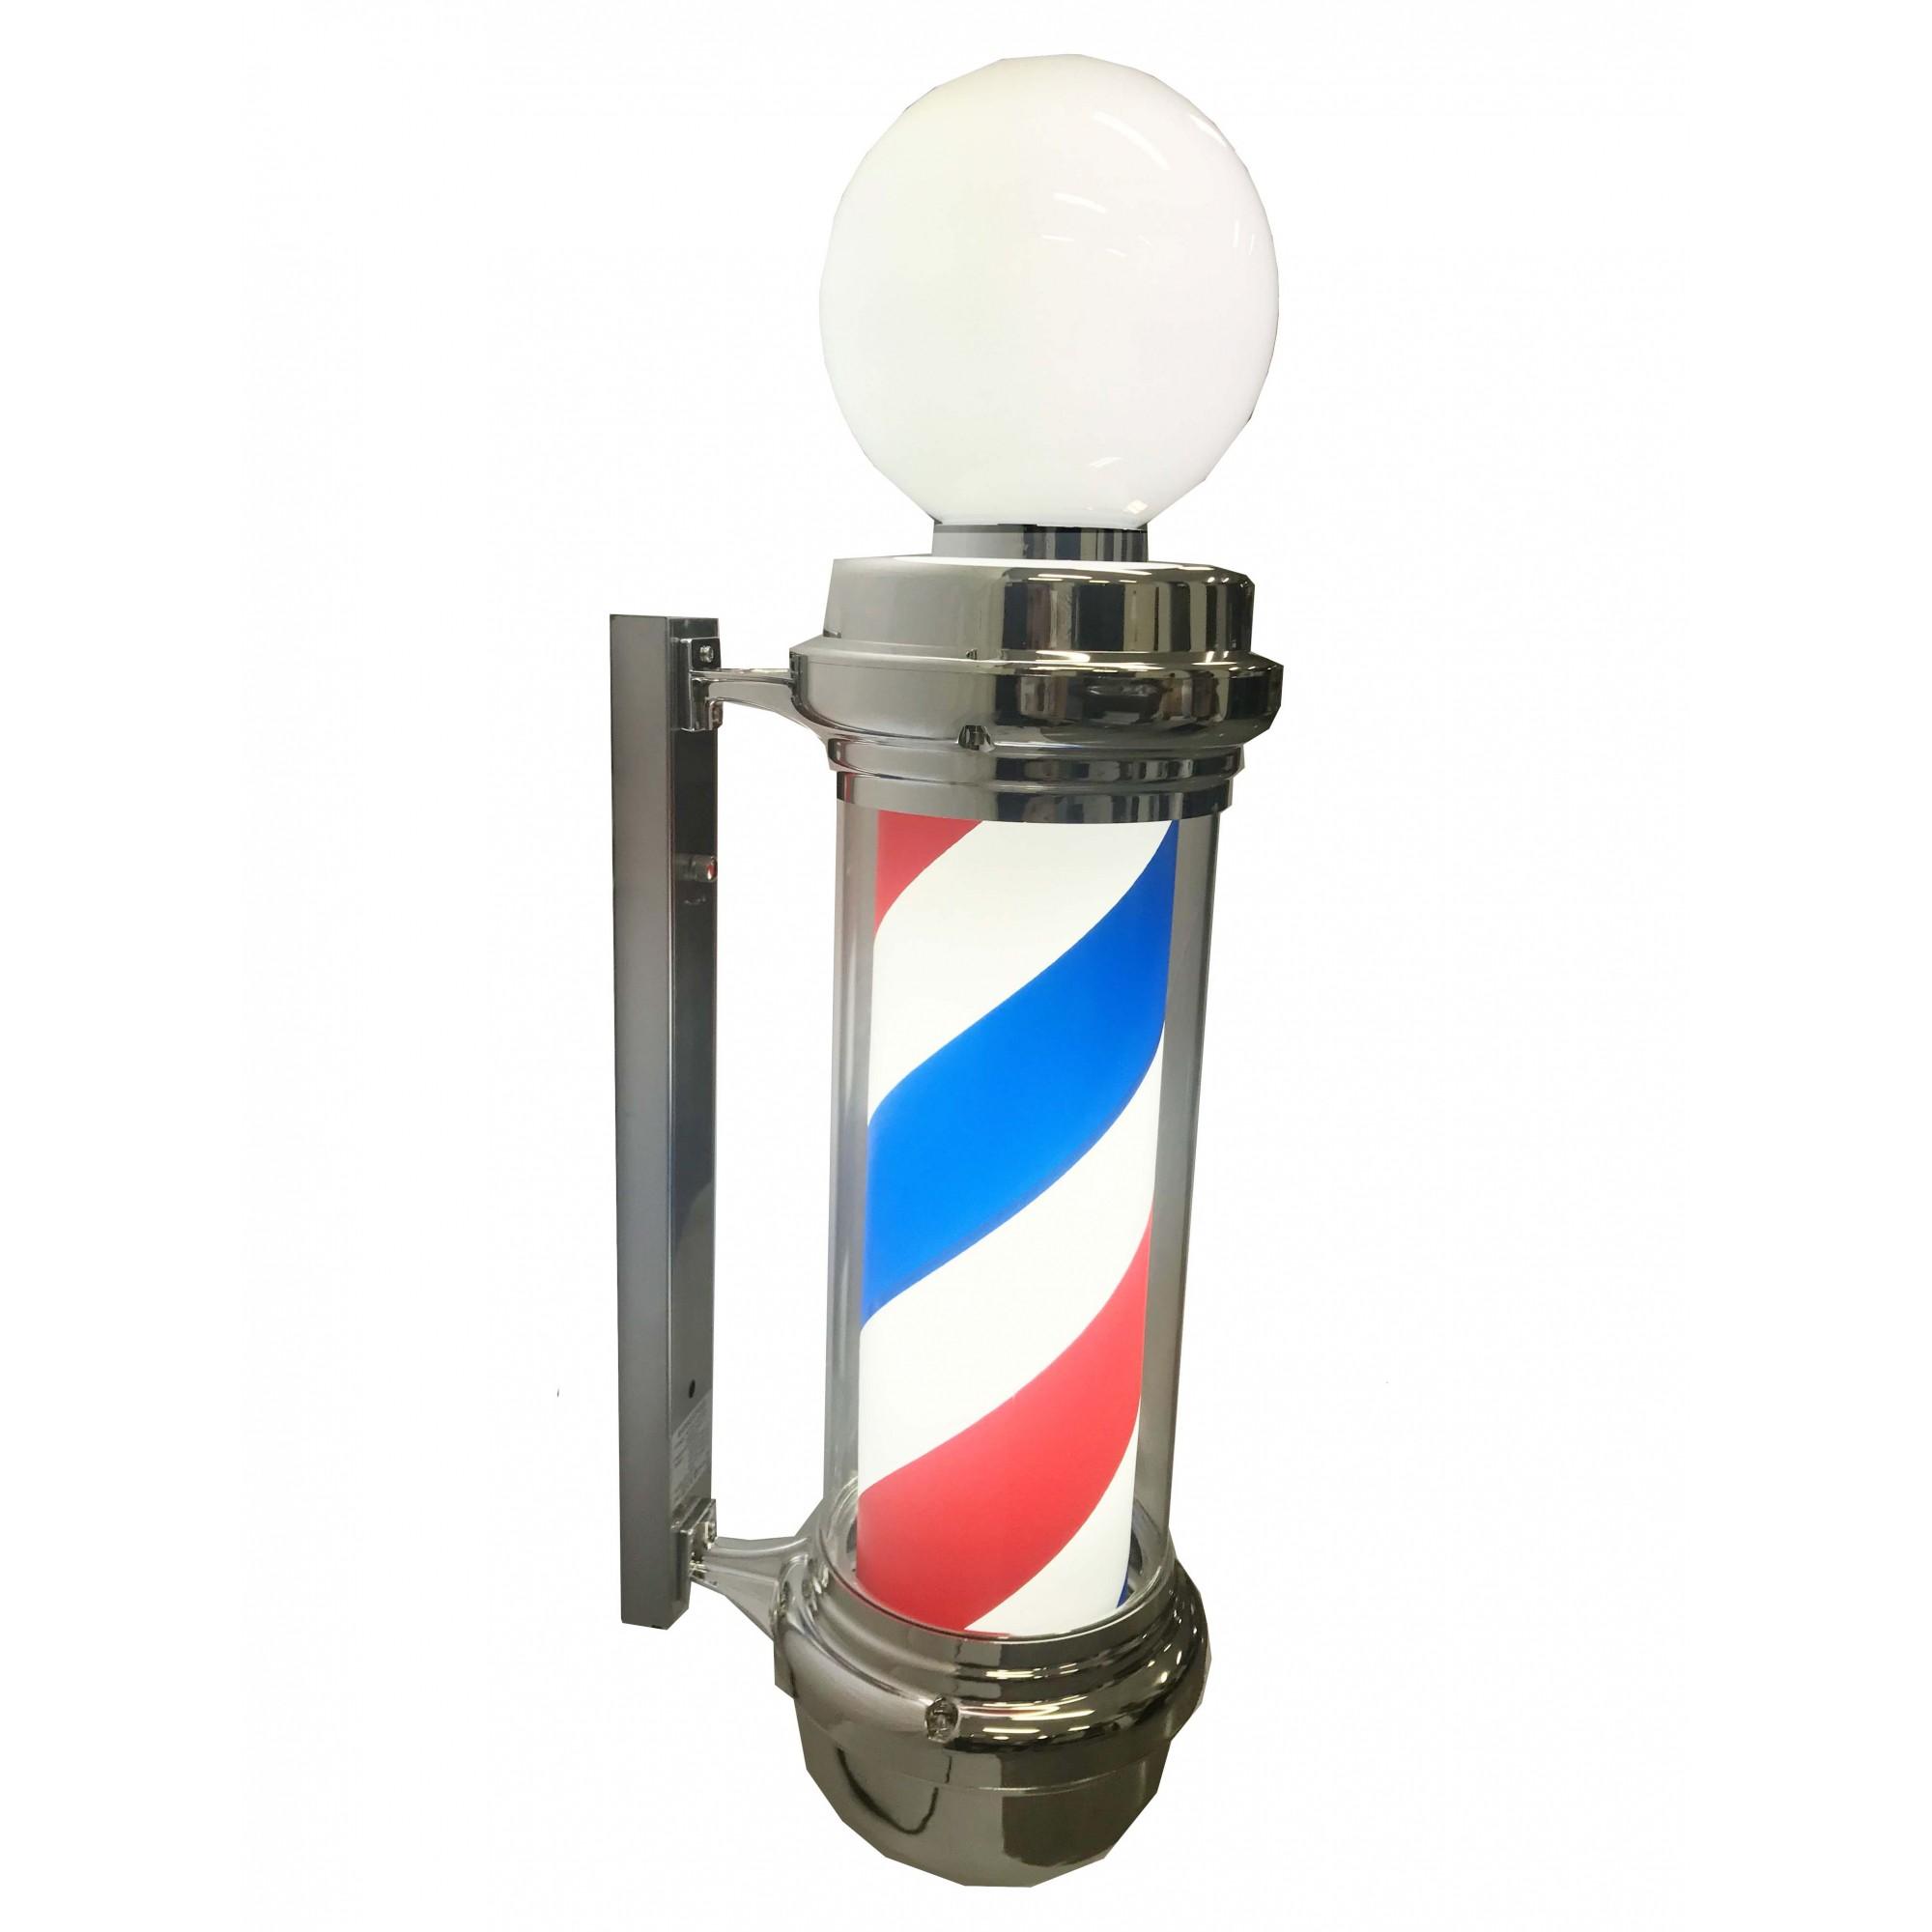 Barber Pole 85 cm - Com Globo